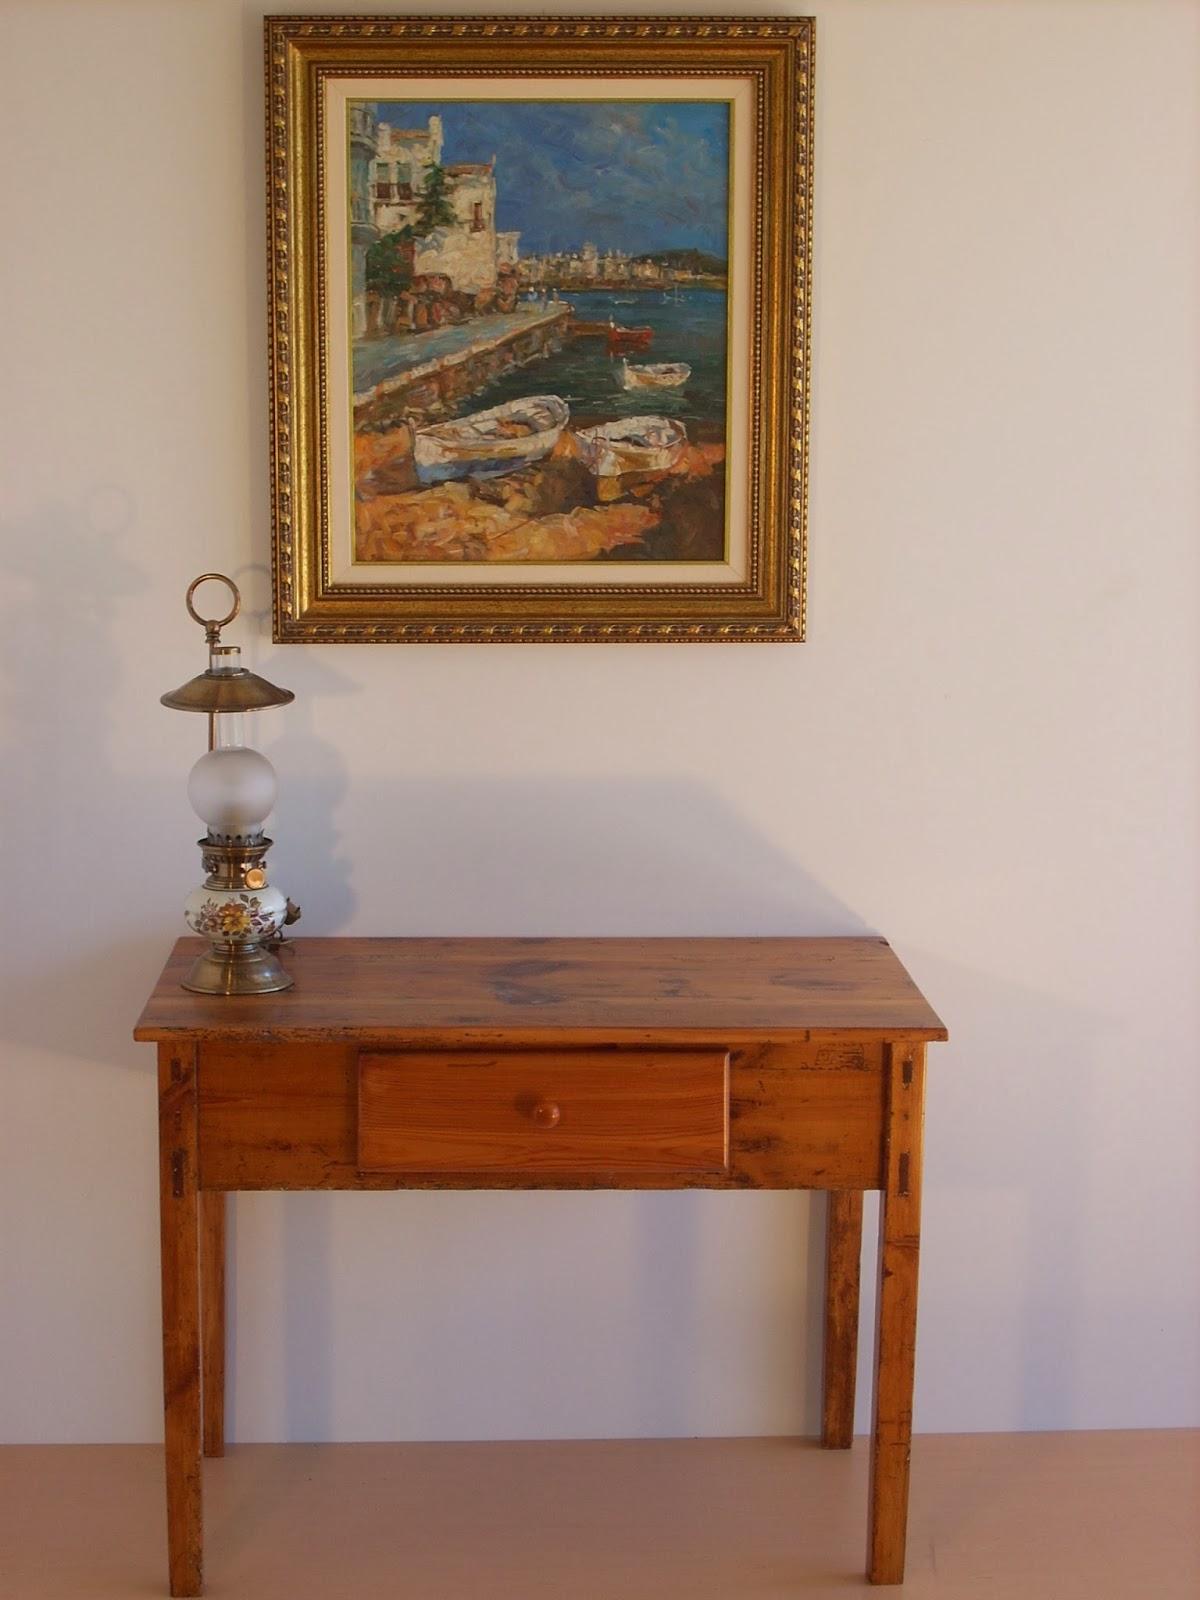 Venta De Muebles Restaurados : Venta de muebles antiguos restaurados naturmoble mesa